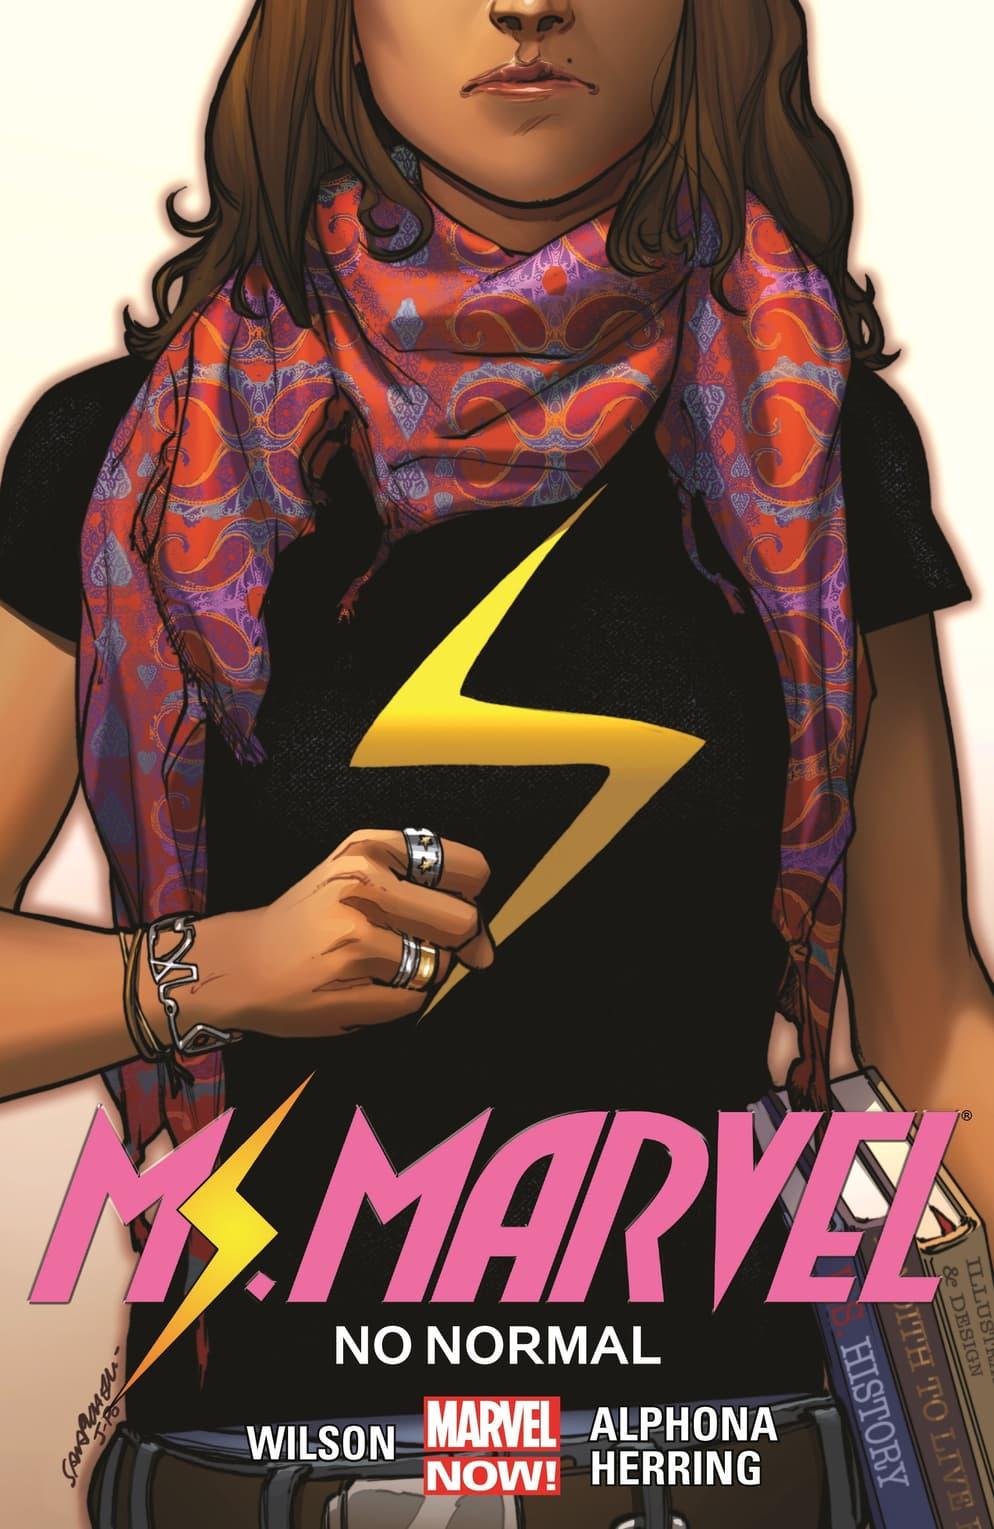 Ms. Marvel Vol. 1: No Normal (Trade Paperback)